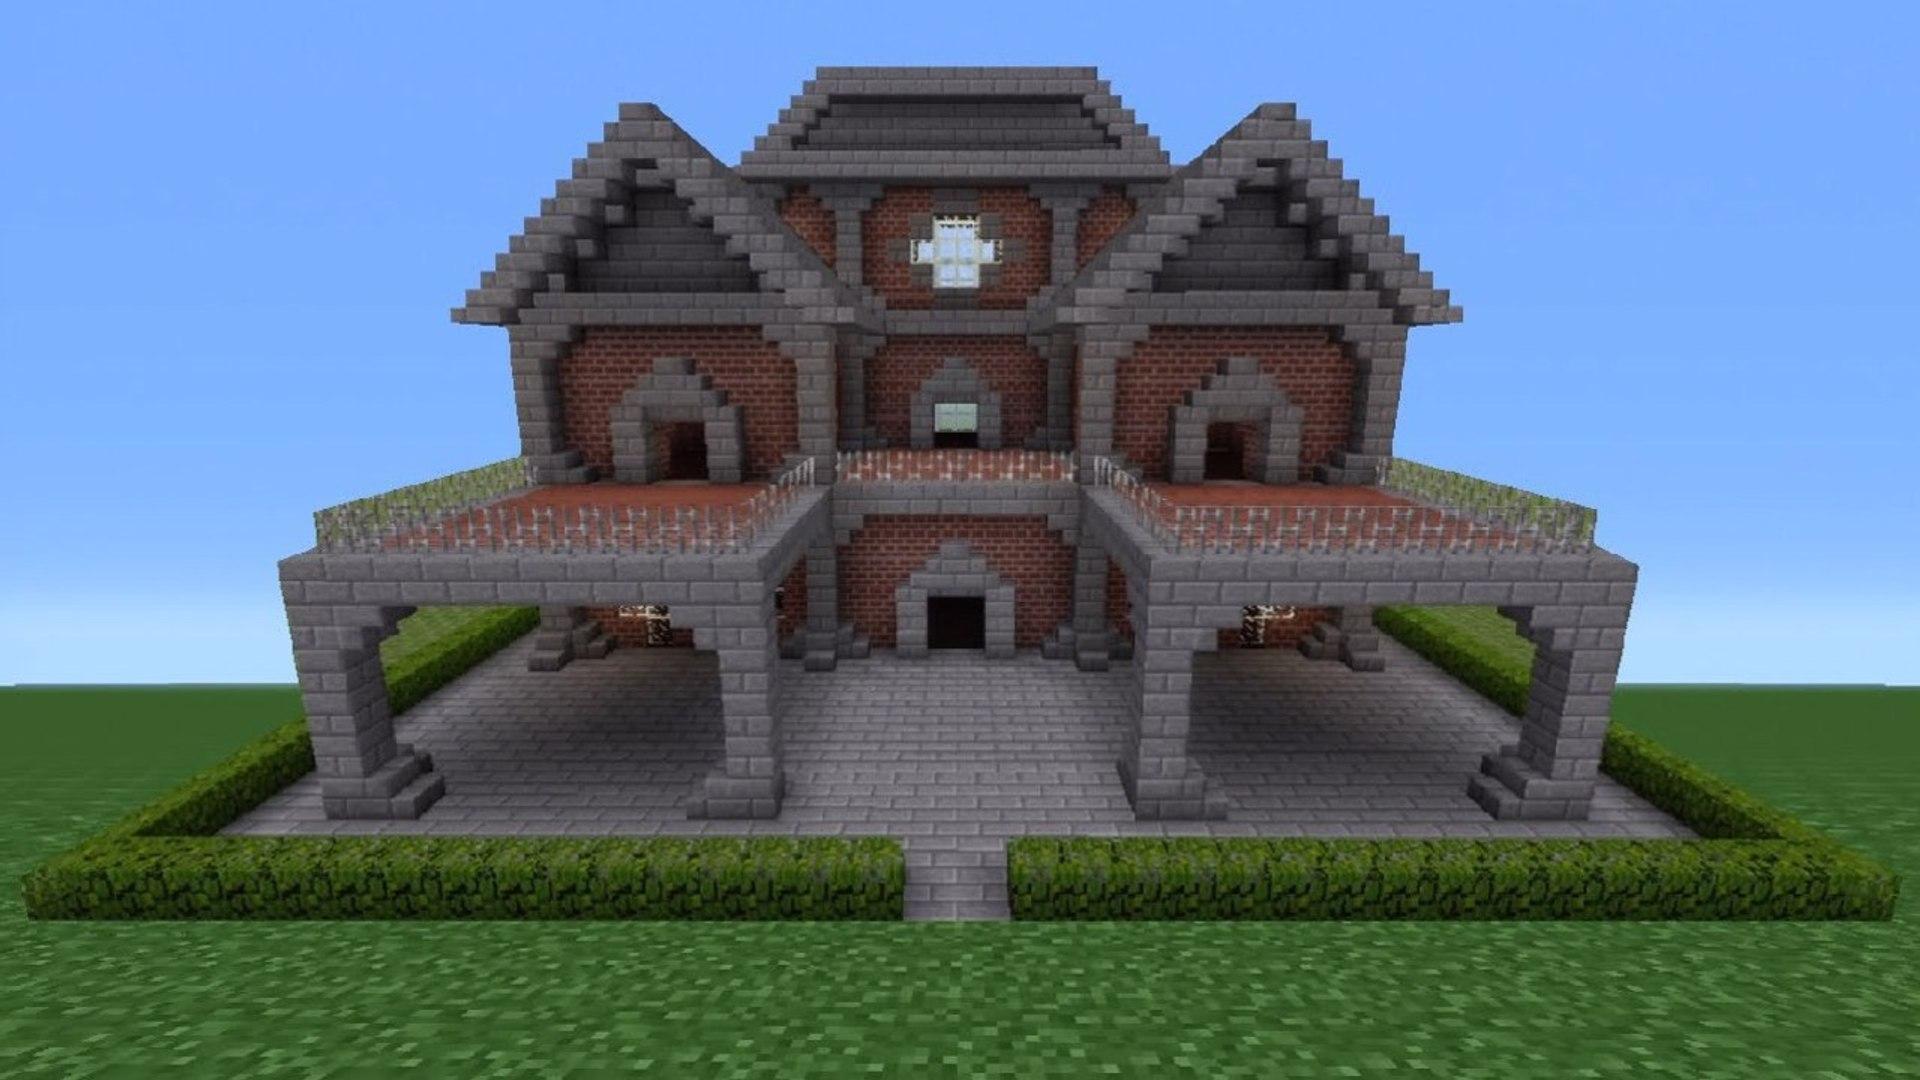 Minecraft Tutorial: Brick House - 11